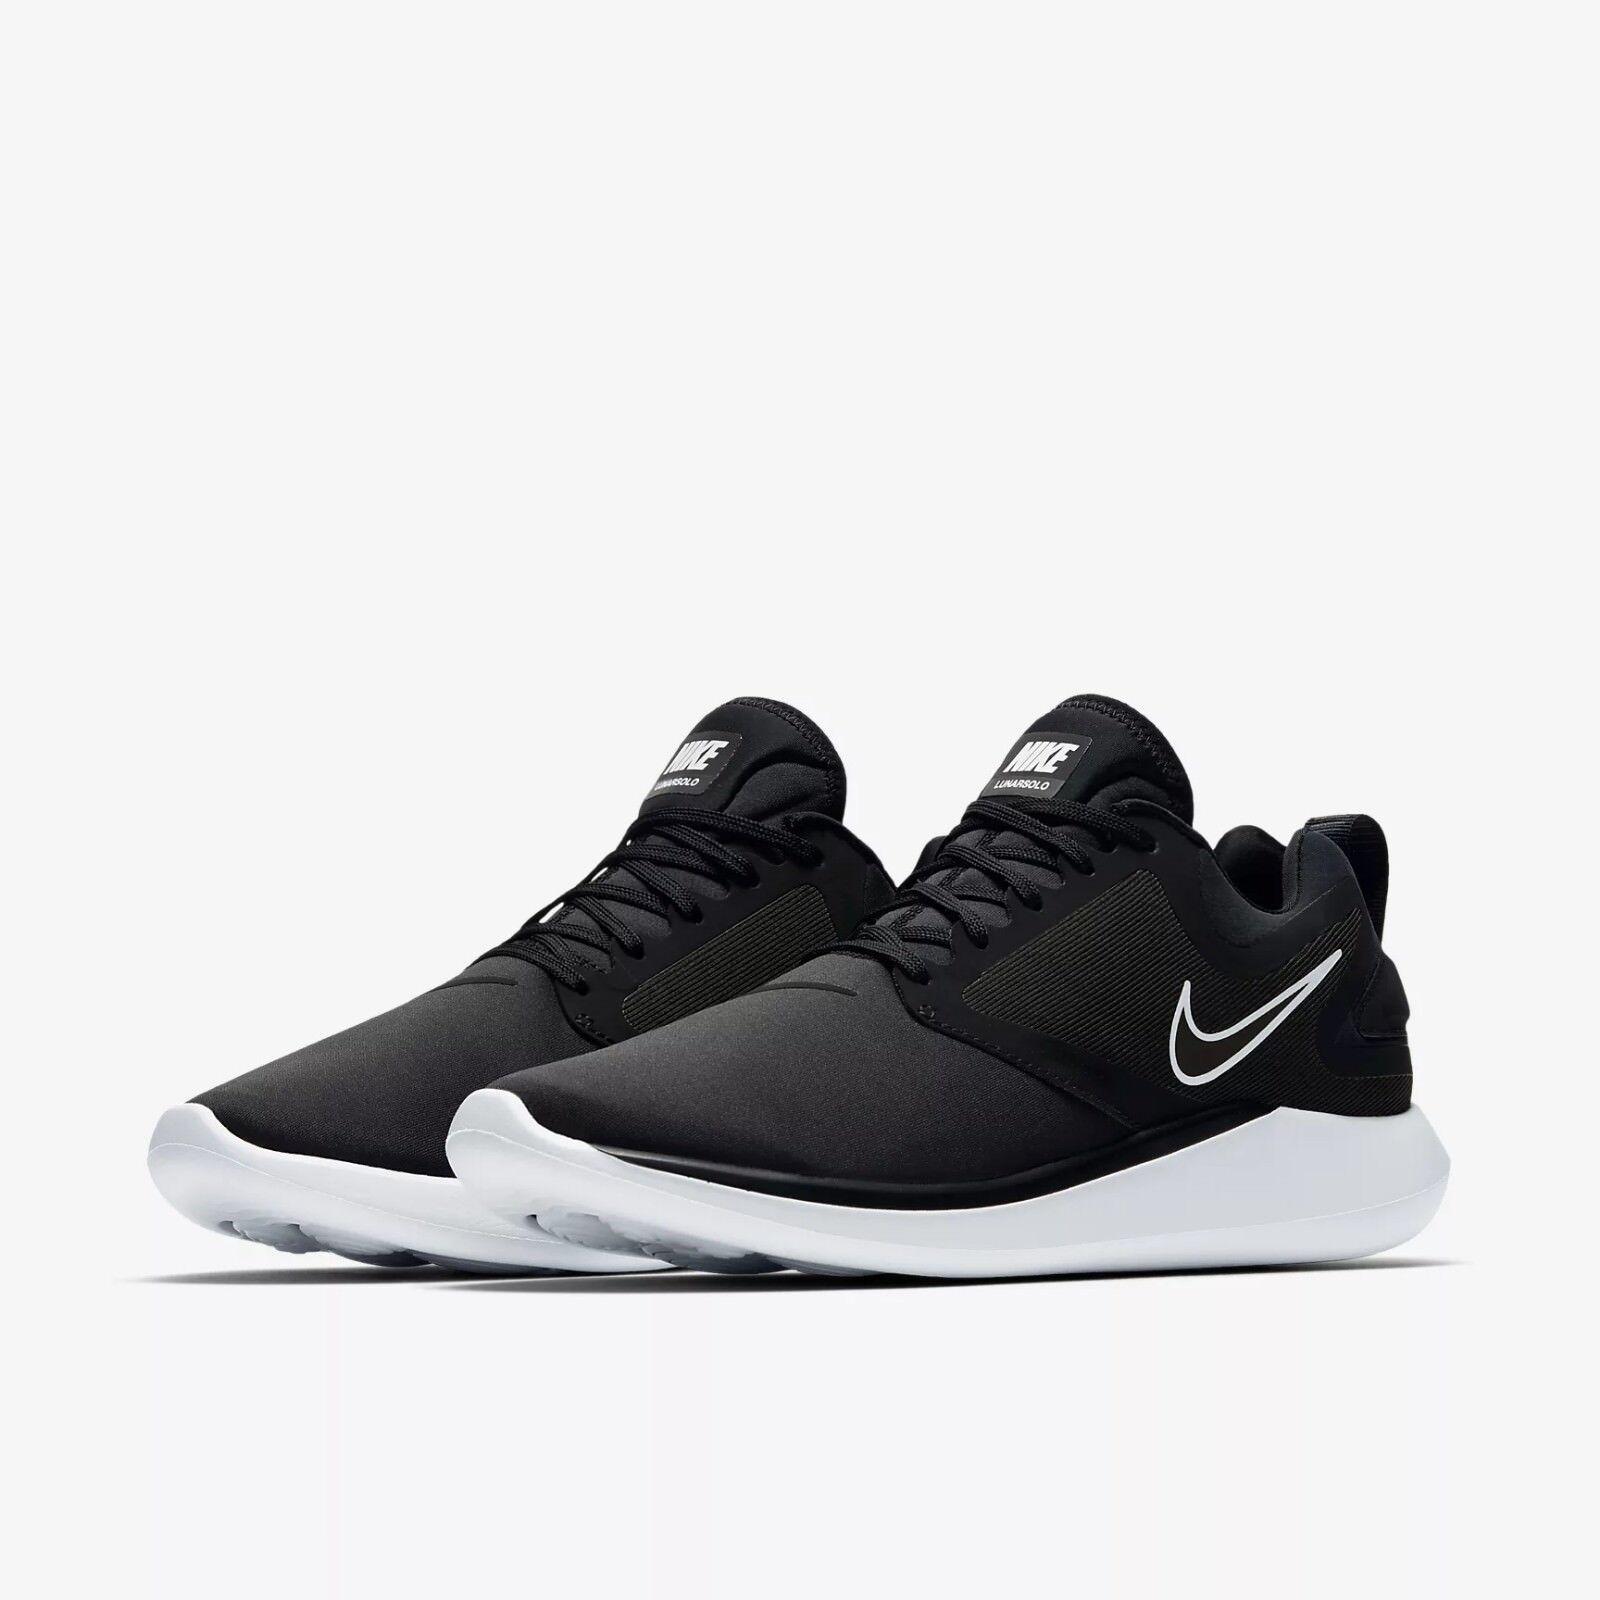 AA4079-001 Nike Lunarsolo Running shoes Black White Sizes 8-13 8-13 8-13 New In Box 90eb92